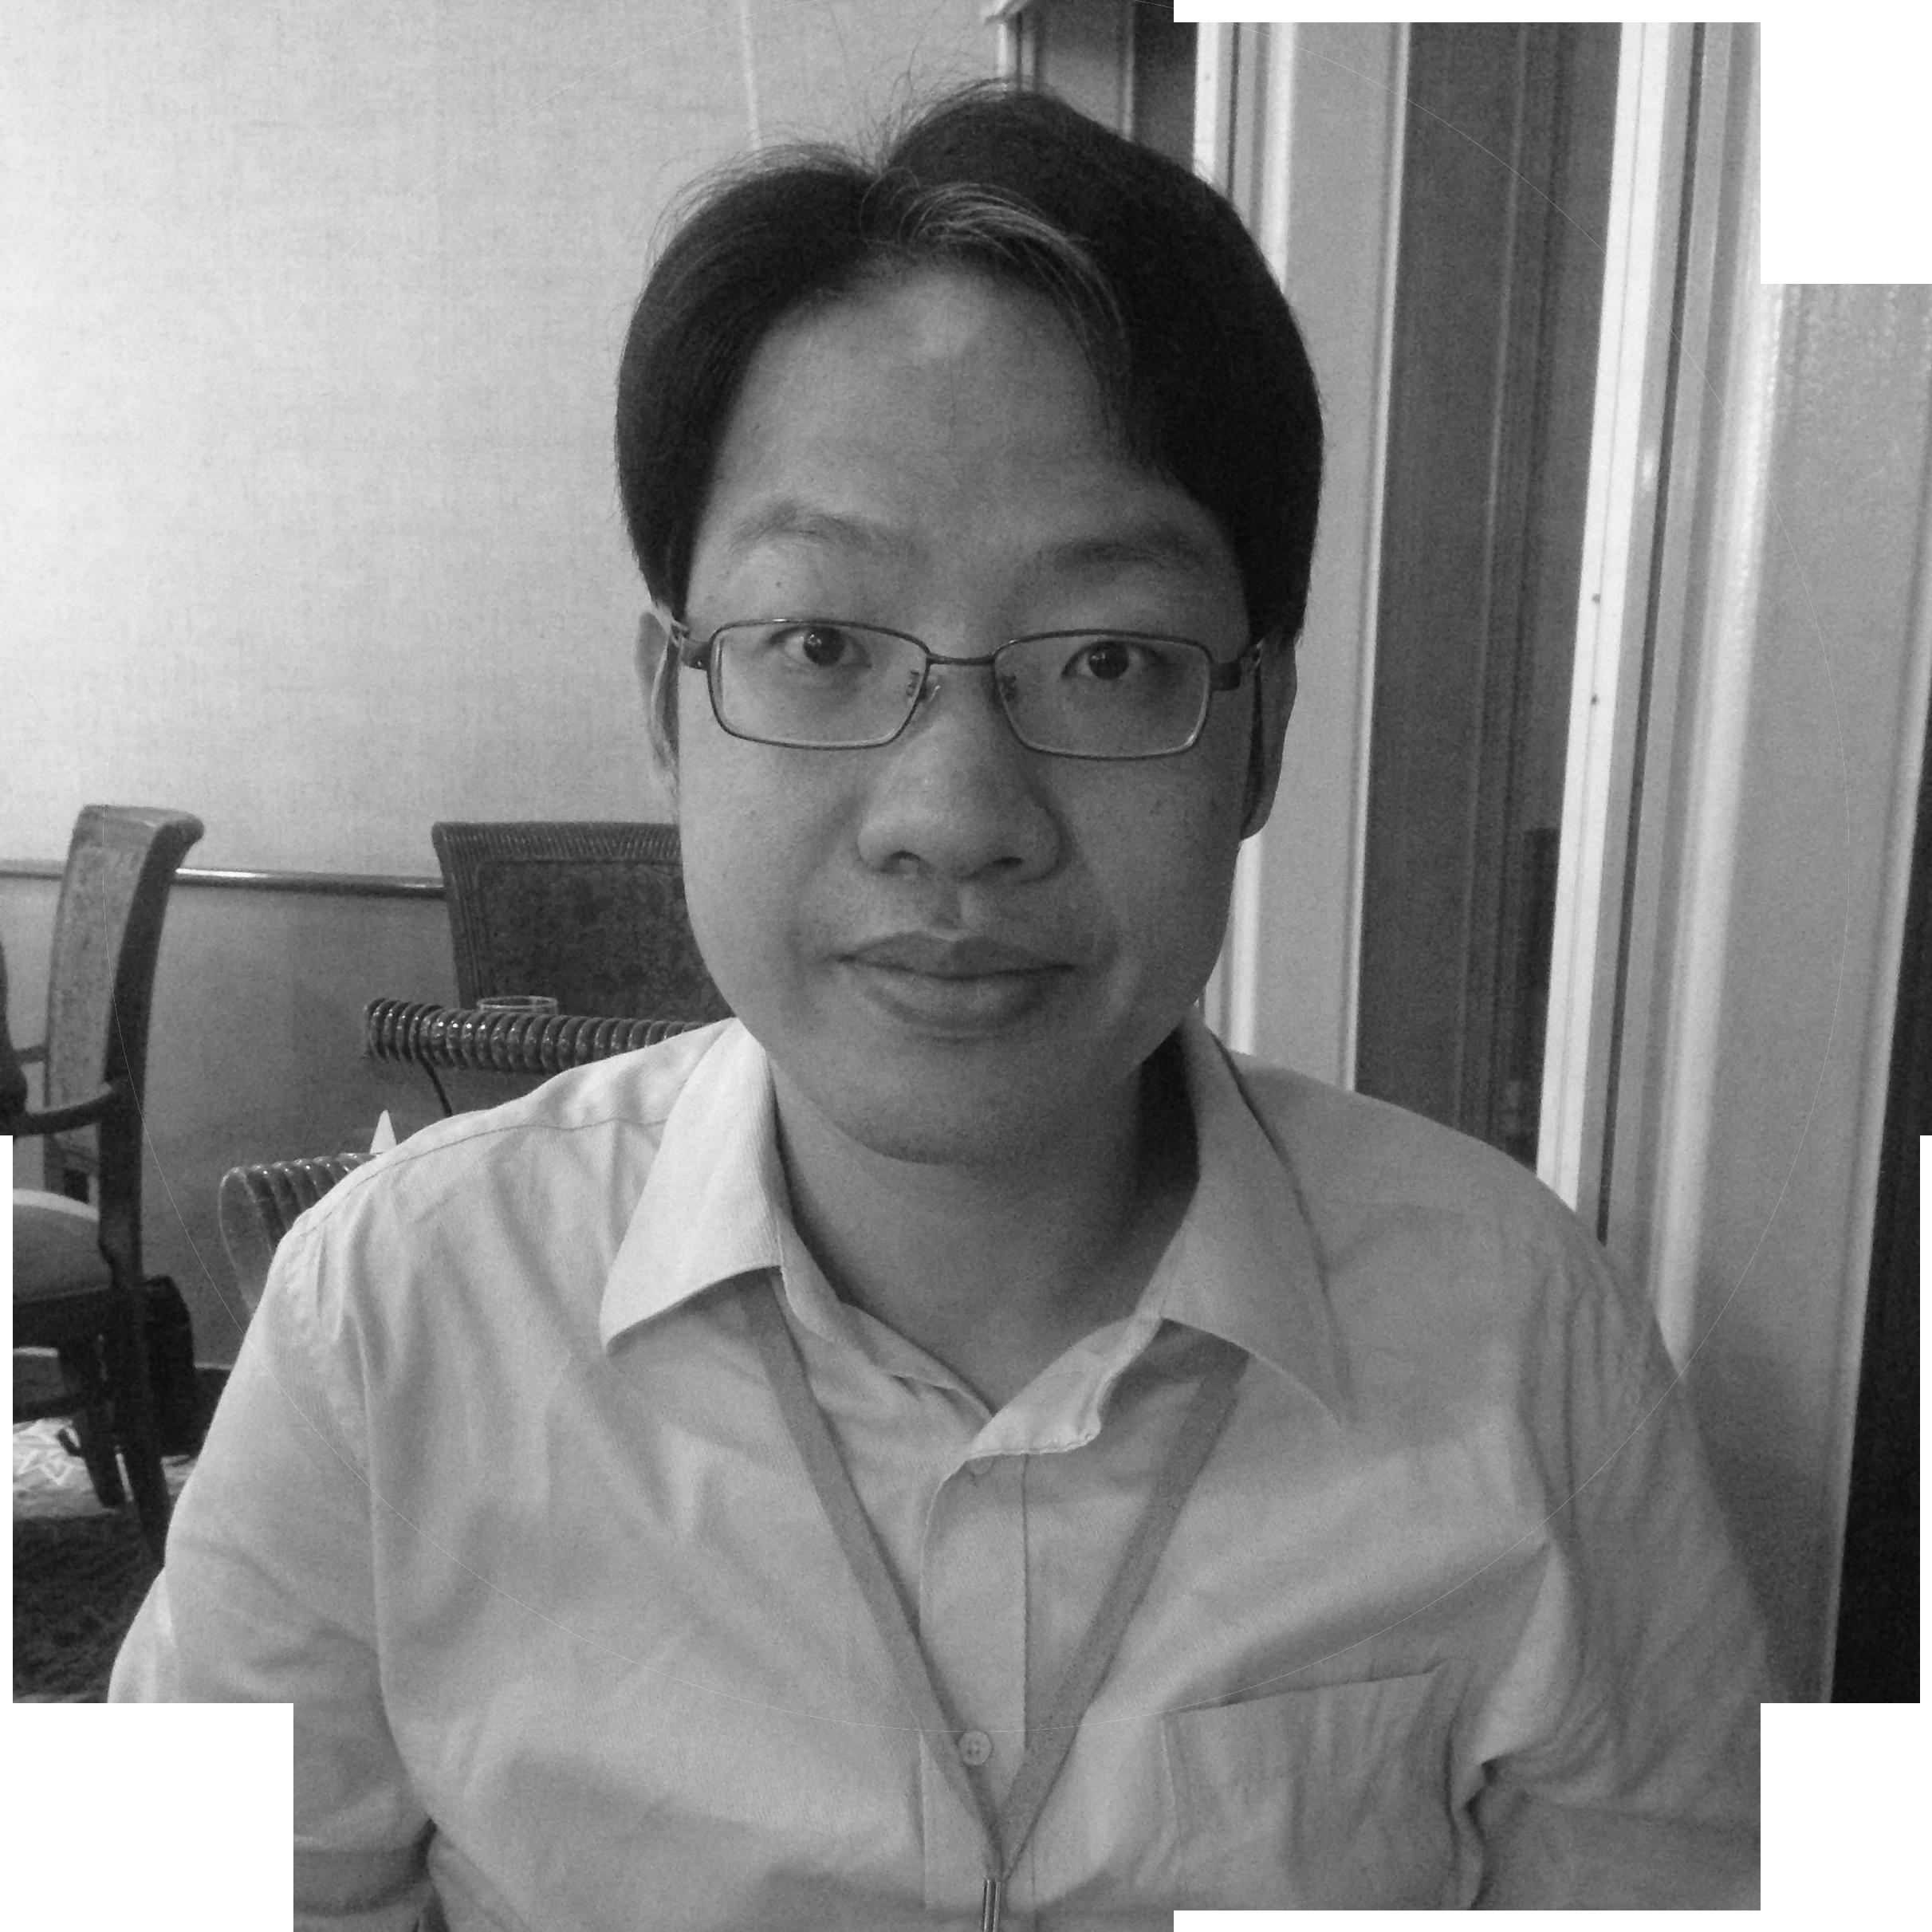 Terry Li - 開発・ディレクターソフトウェア開発のエキスパートフォックスコン社のソフトウェア開発マネージャー などを歴任